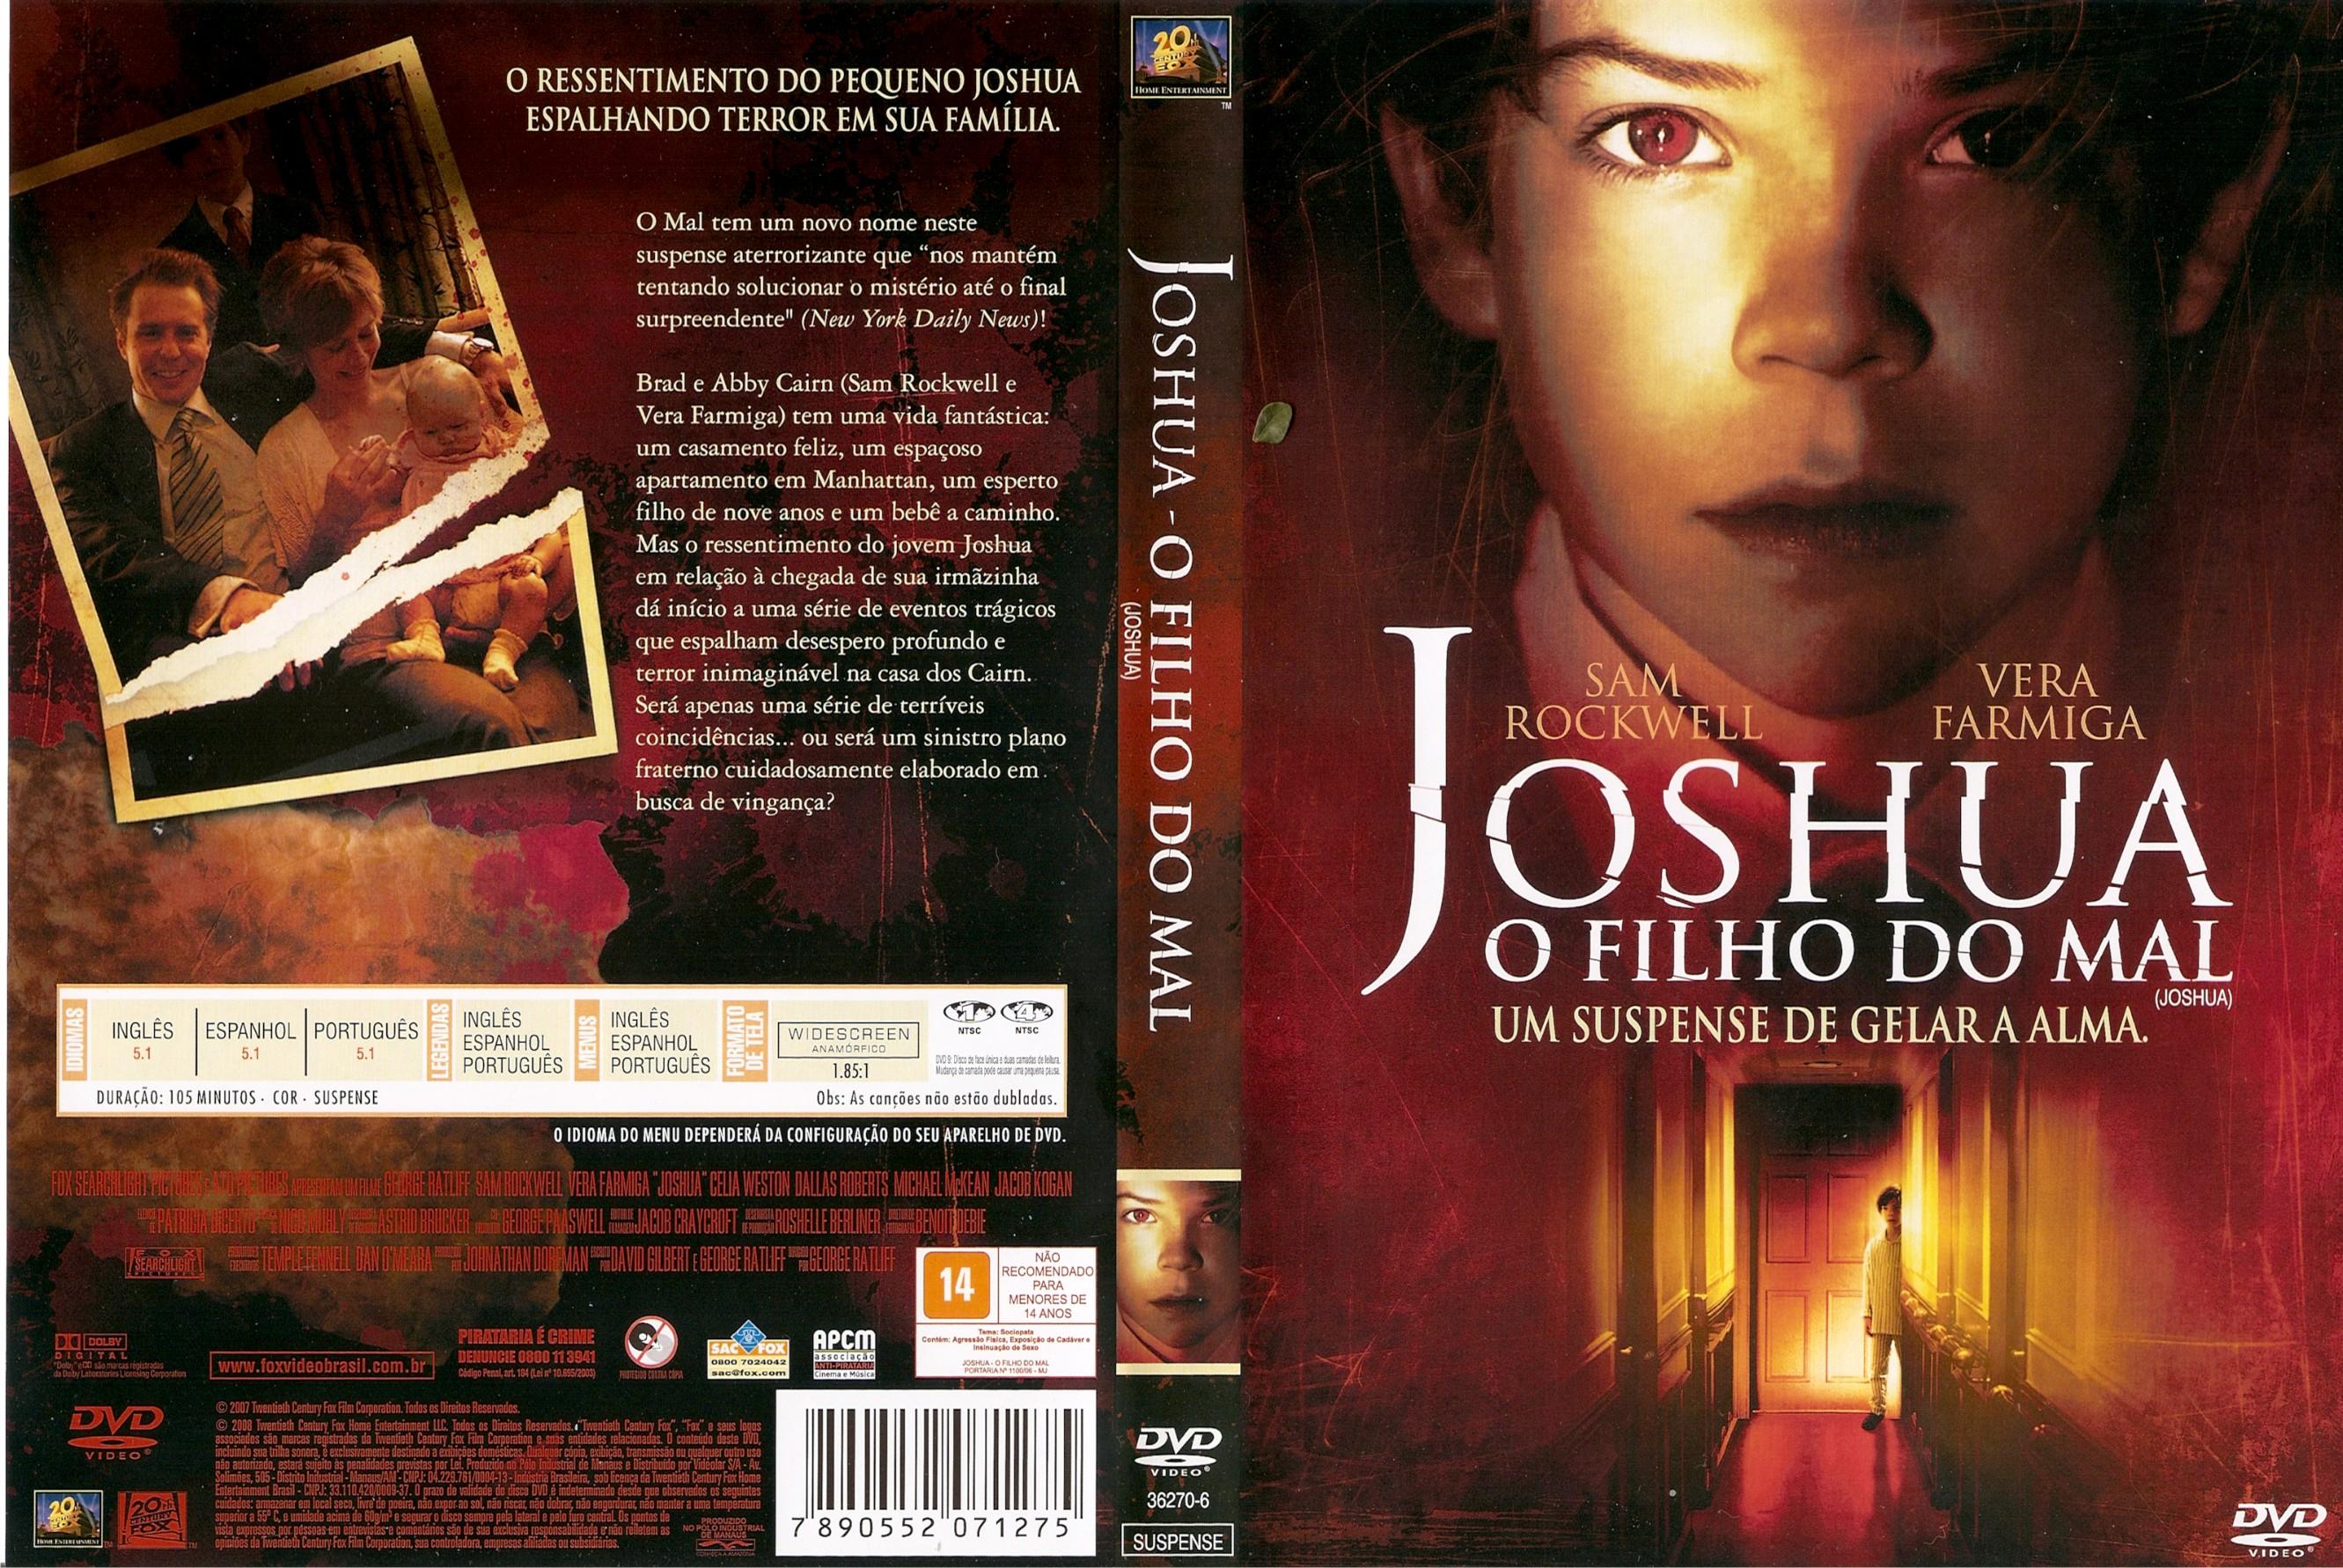 JoshuaOFilhoDoMal